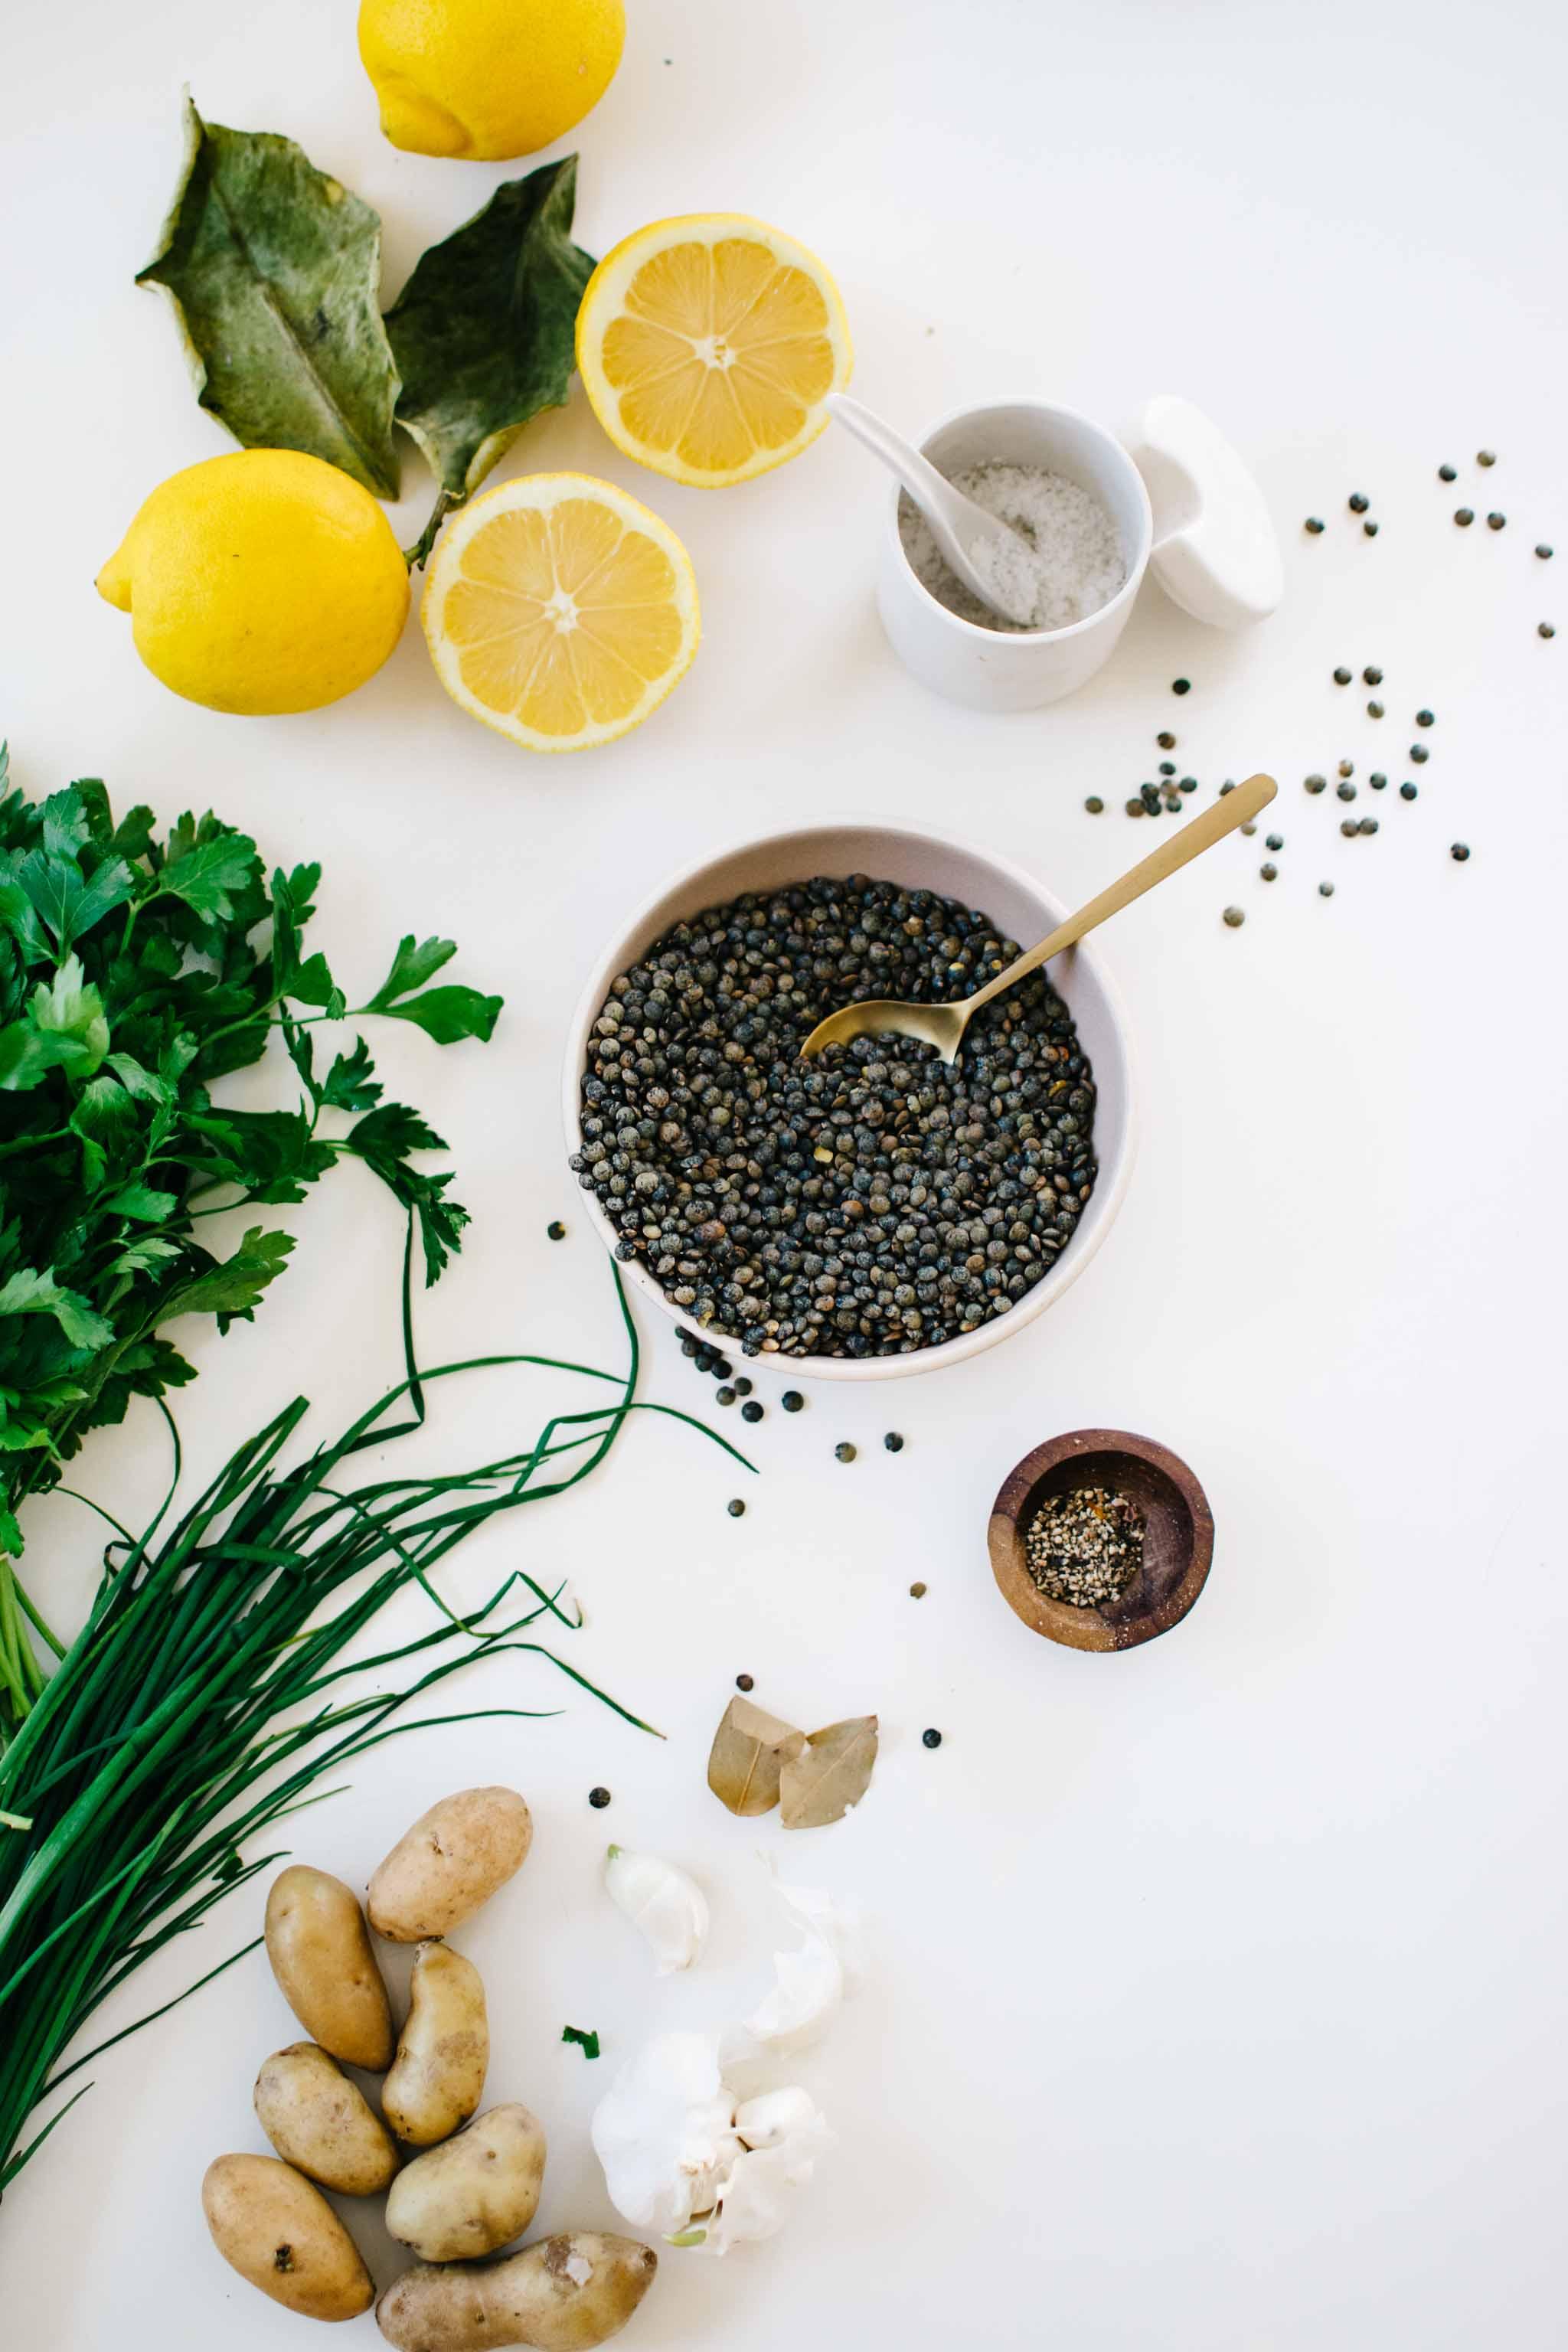 ingredients lentils potatos herbs